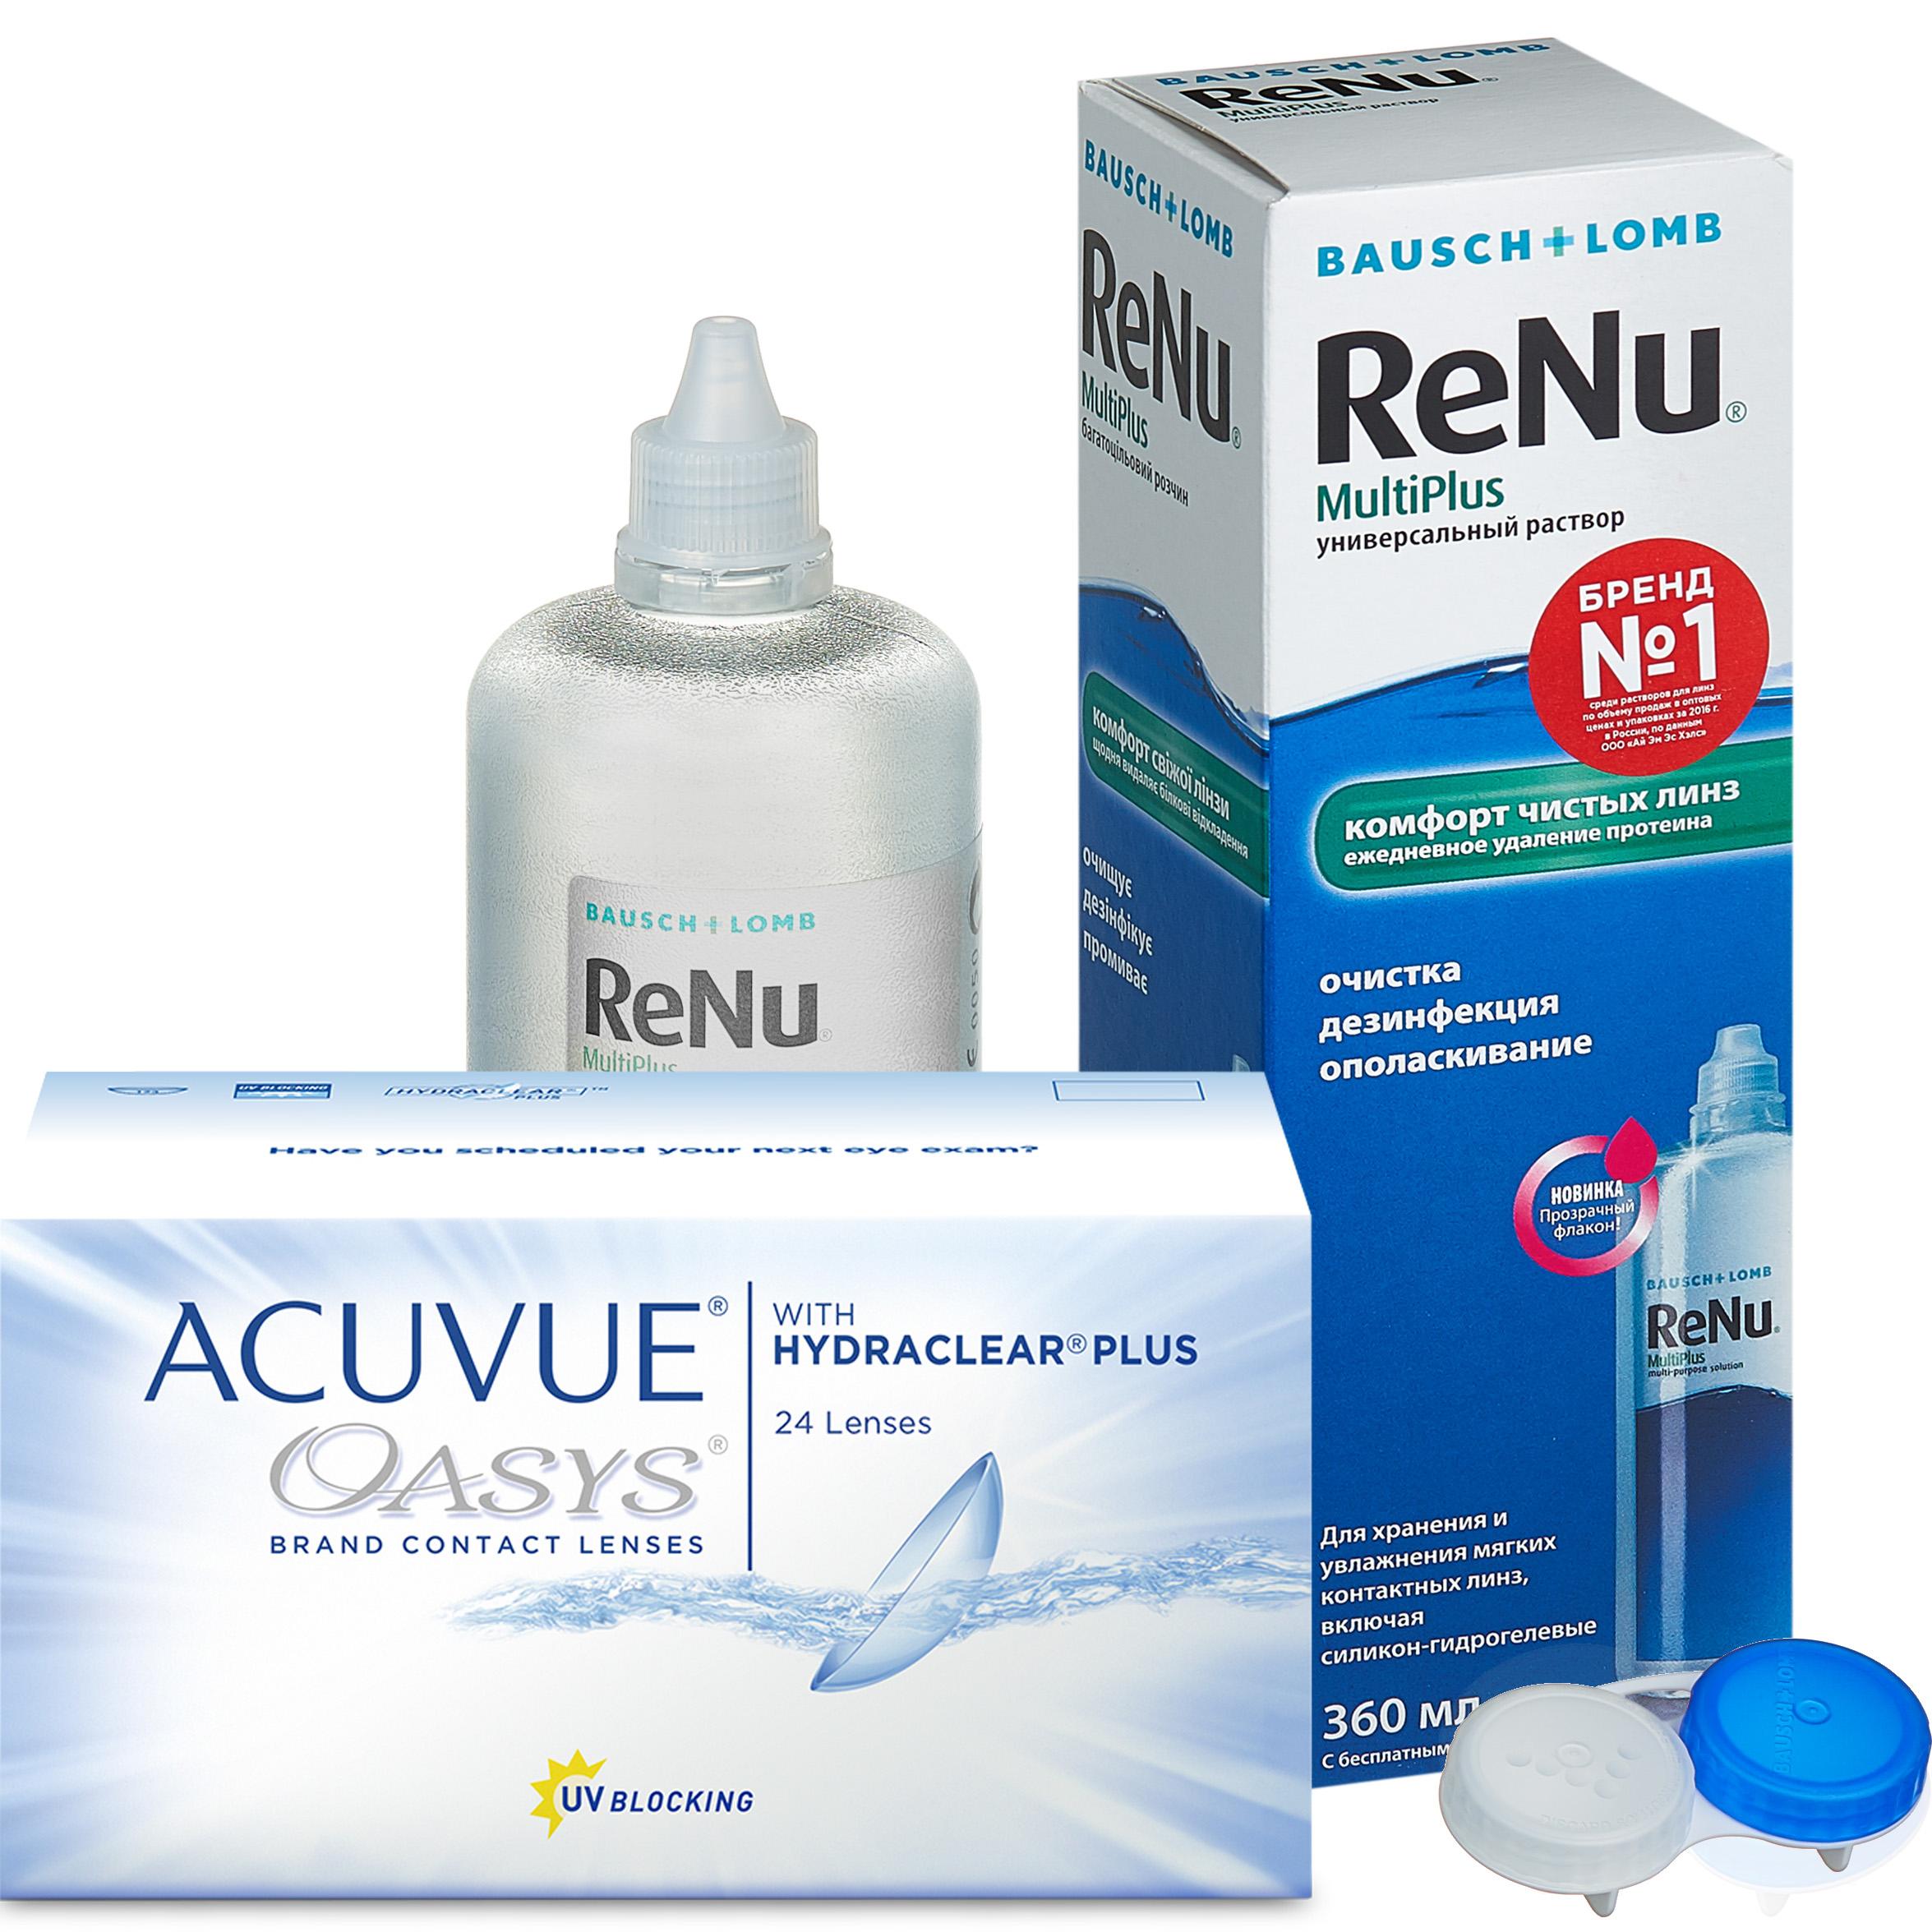 Купить Oasys with Hydraclear Plus 24 линзы + ReNu MultiPlus, Линзы Acuvue Oasys with Hydraclear Plus 24 линзы R 8.4 +6, 50 + ReNu Multi Plus 360 мл